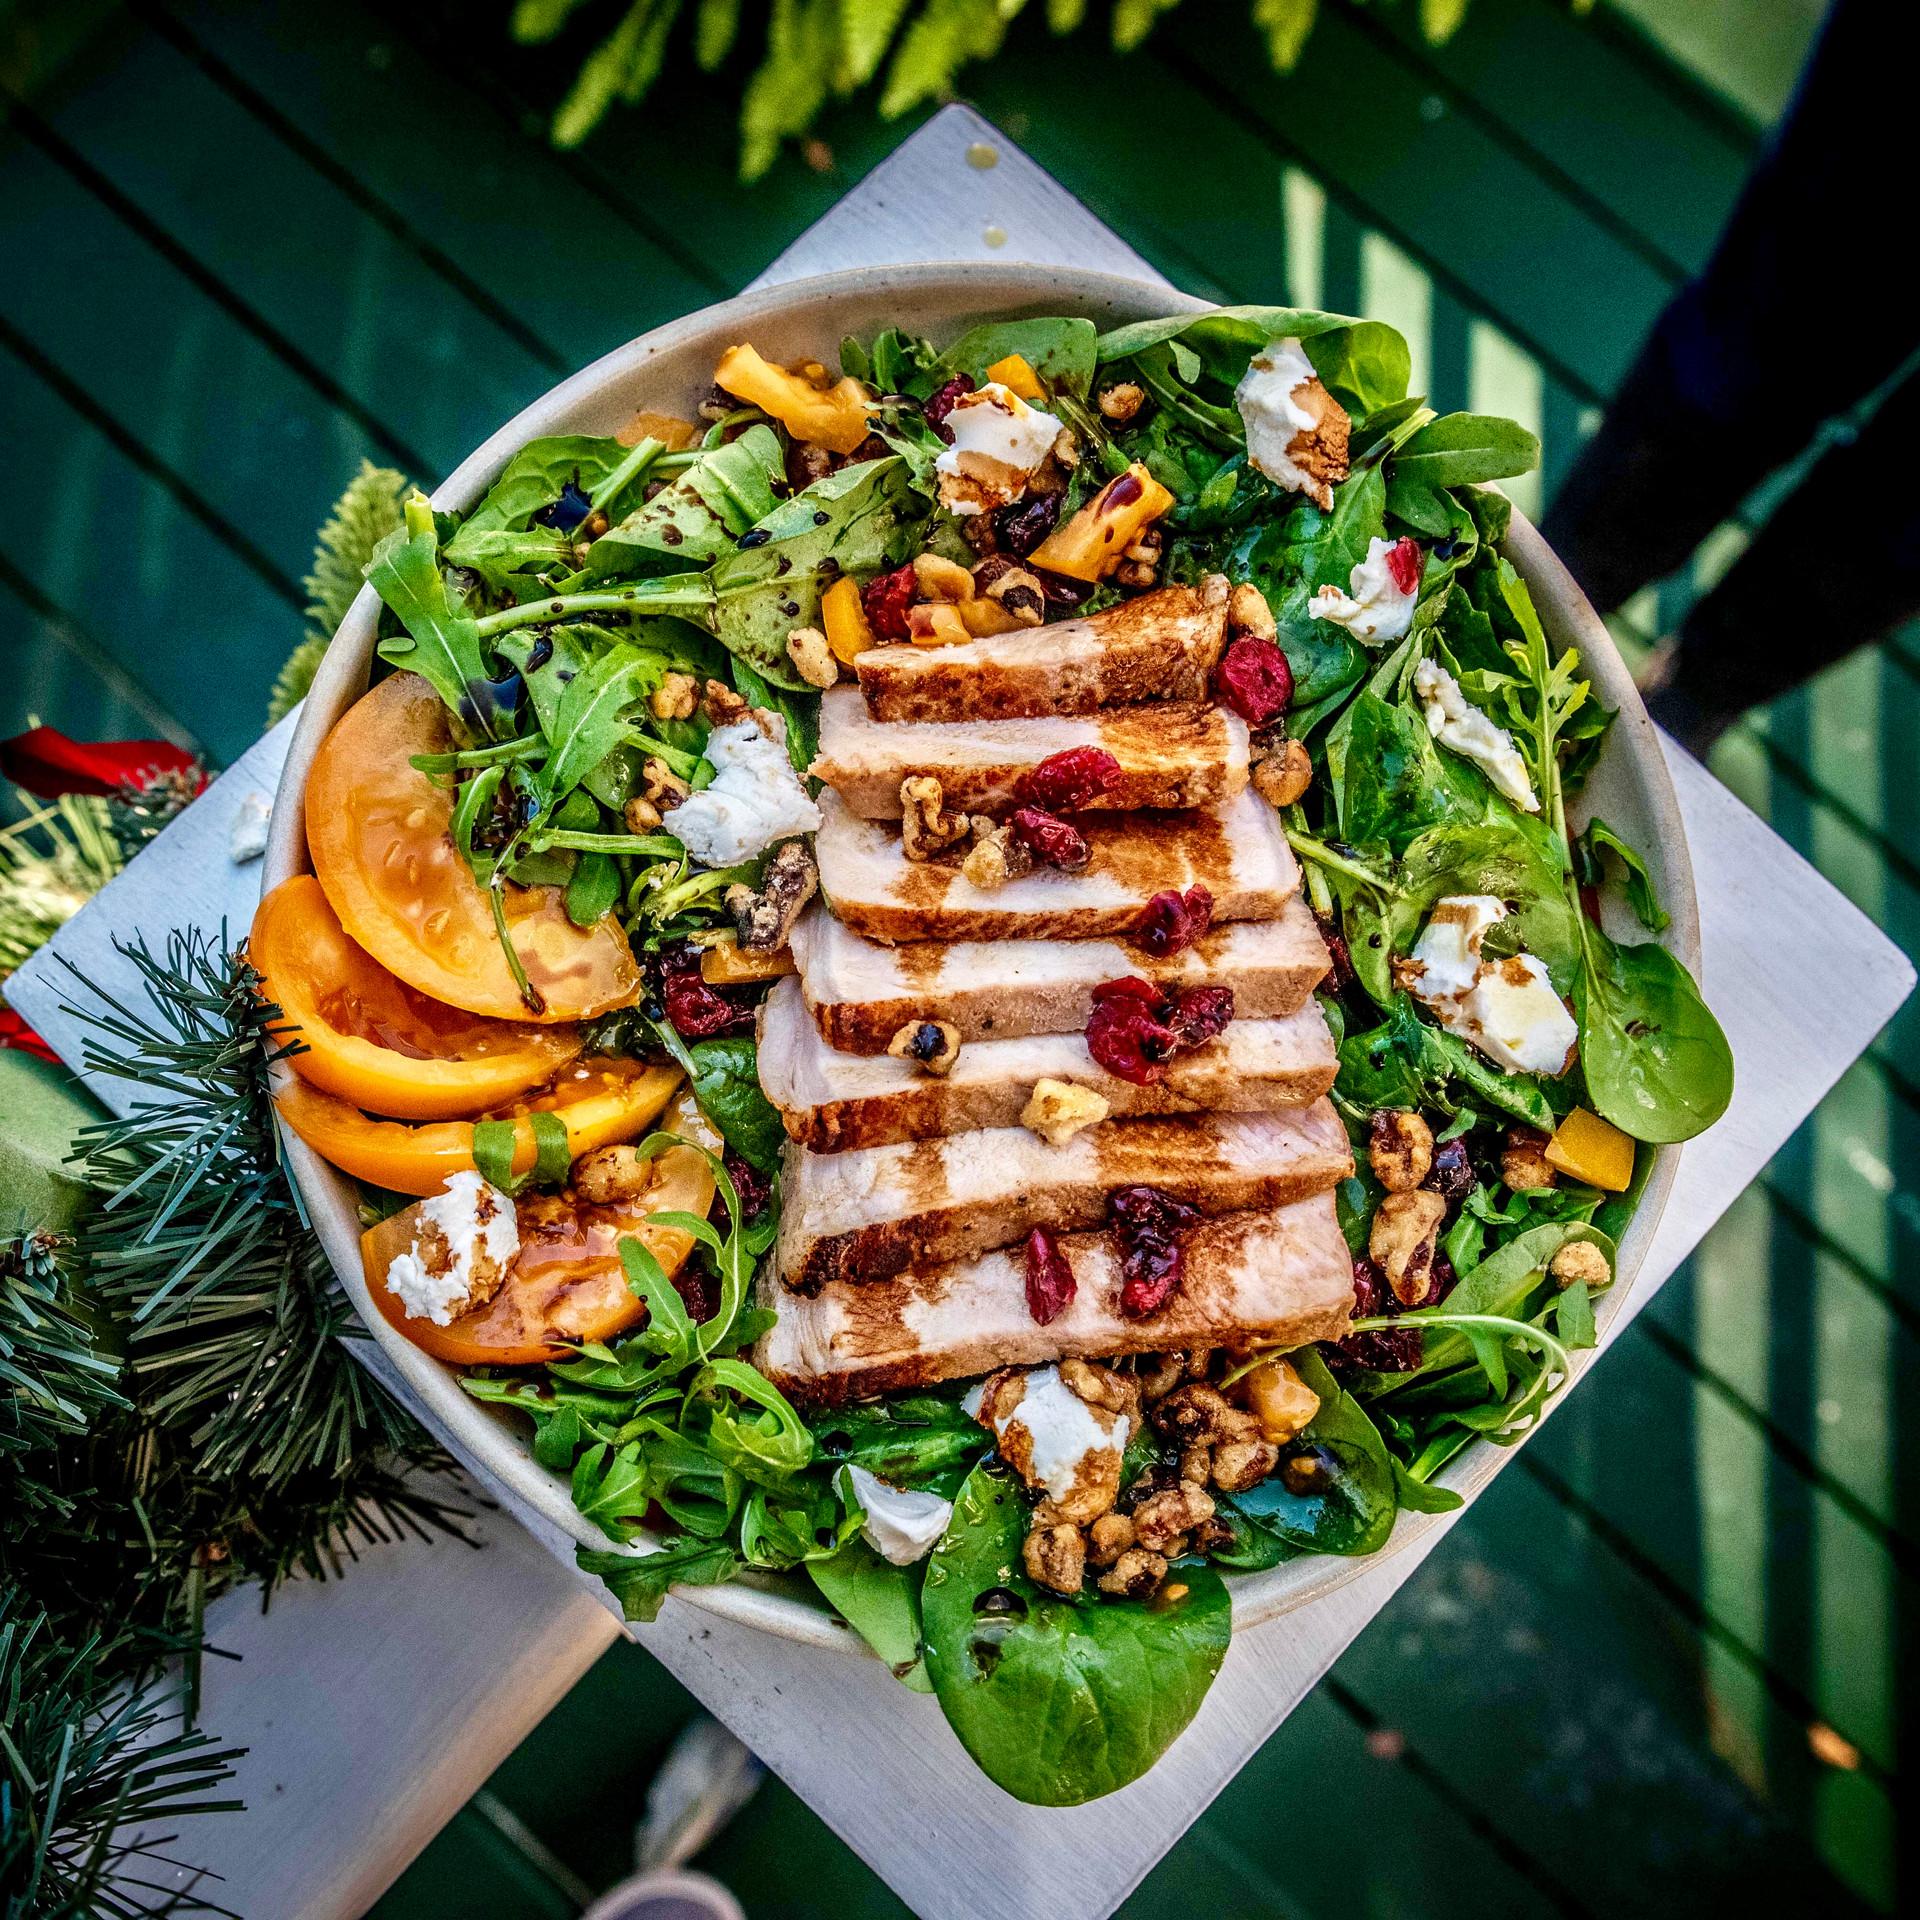 Pork Loin Salad shot for